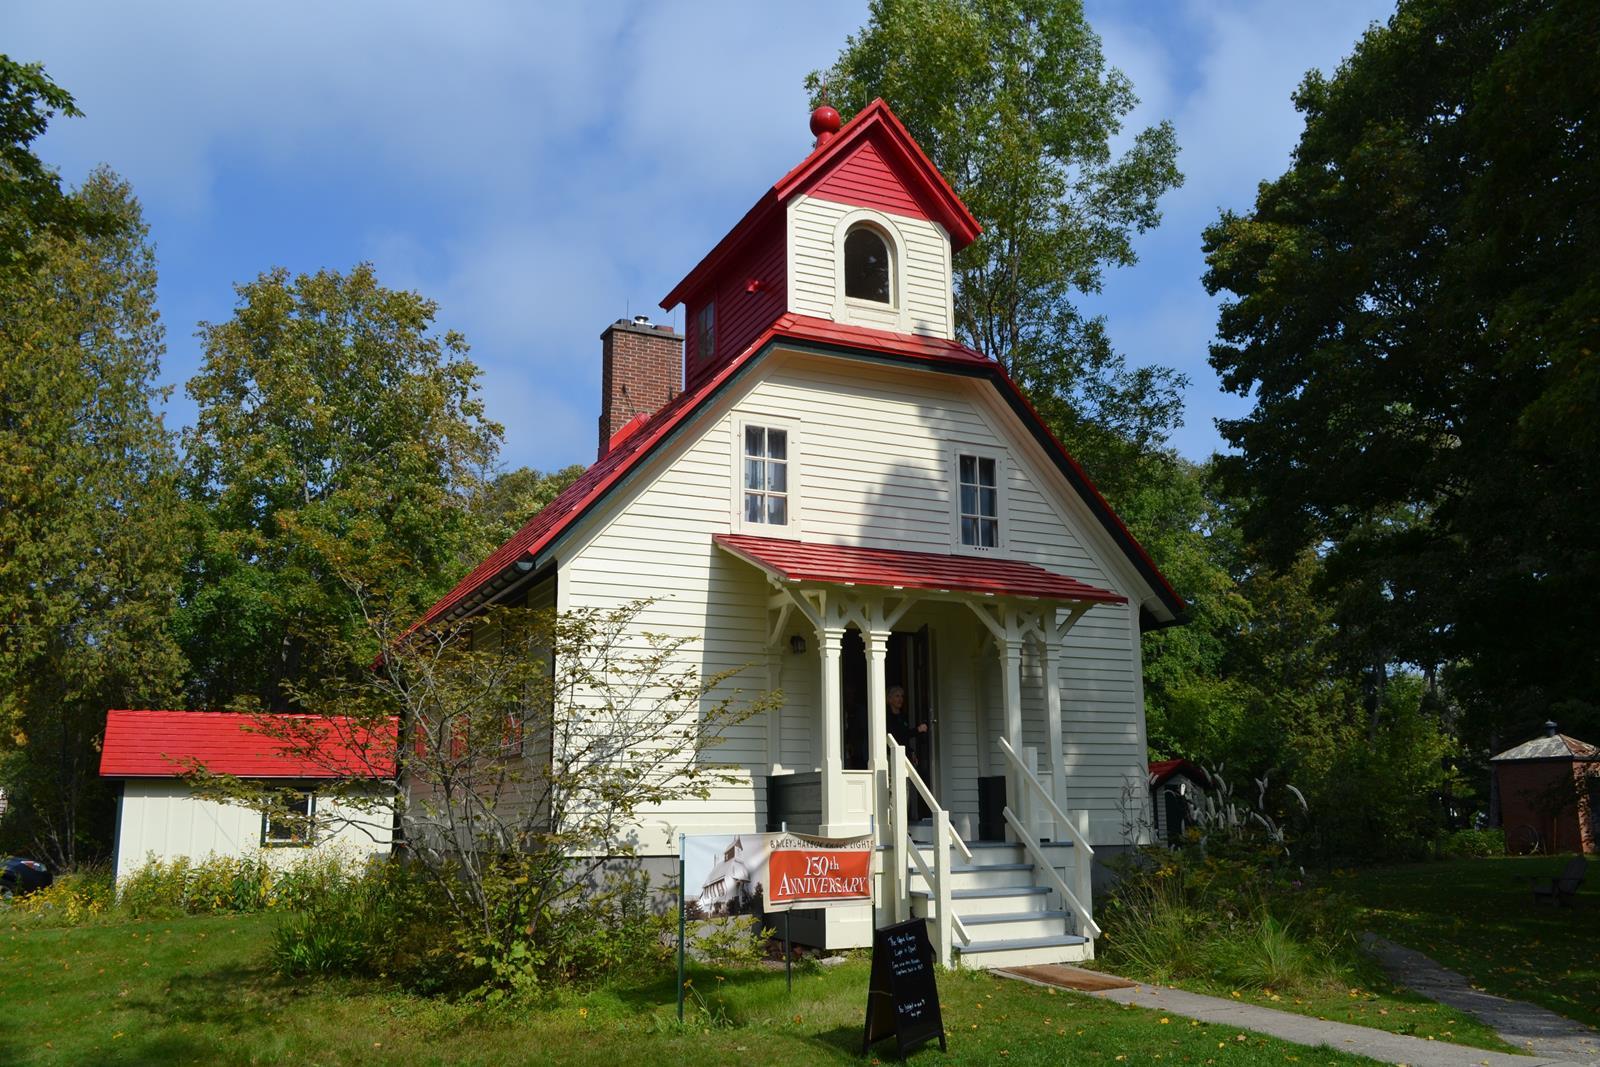 Upper Range Lighthouse in Door County has been restored and is open to visitors